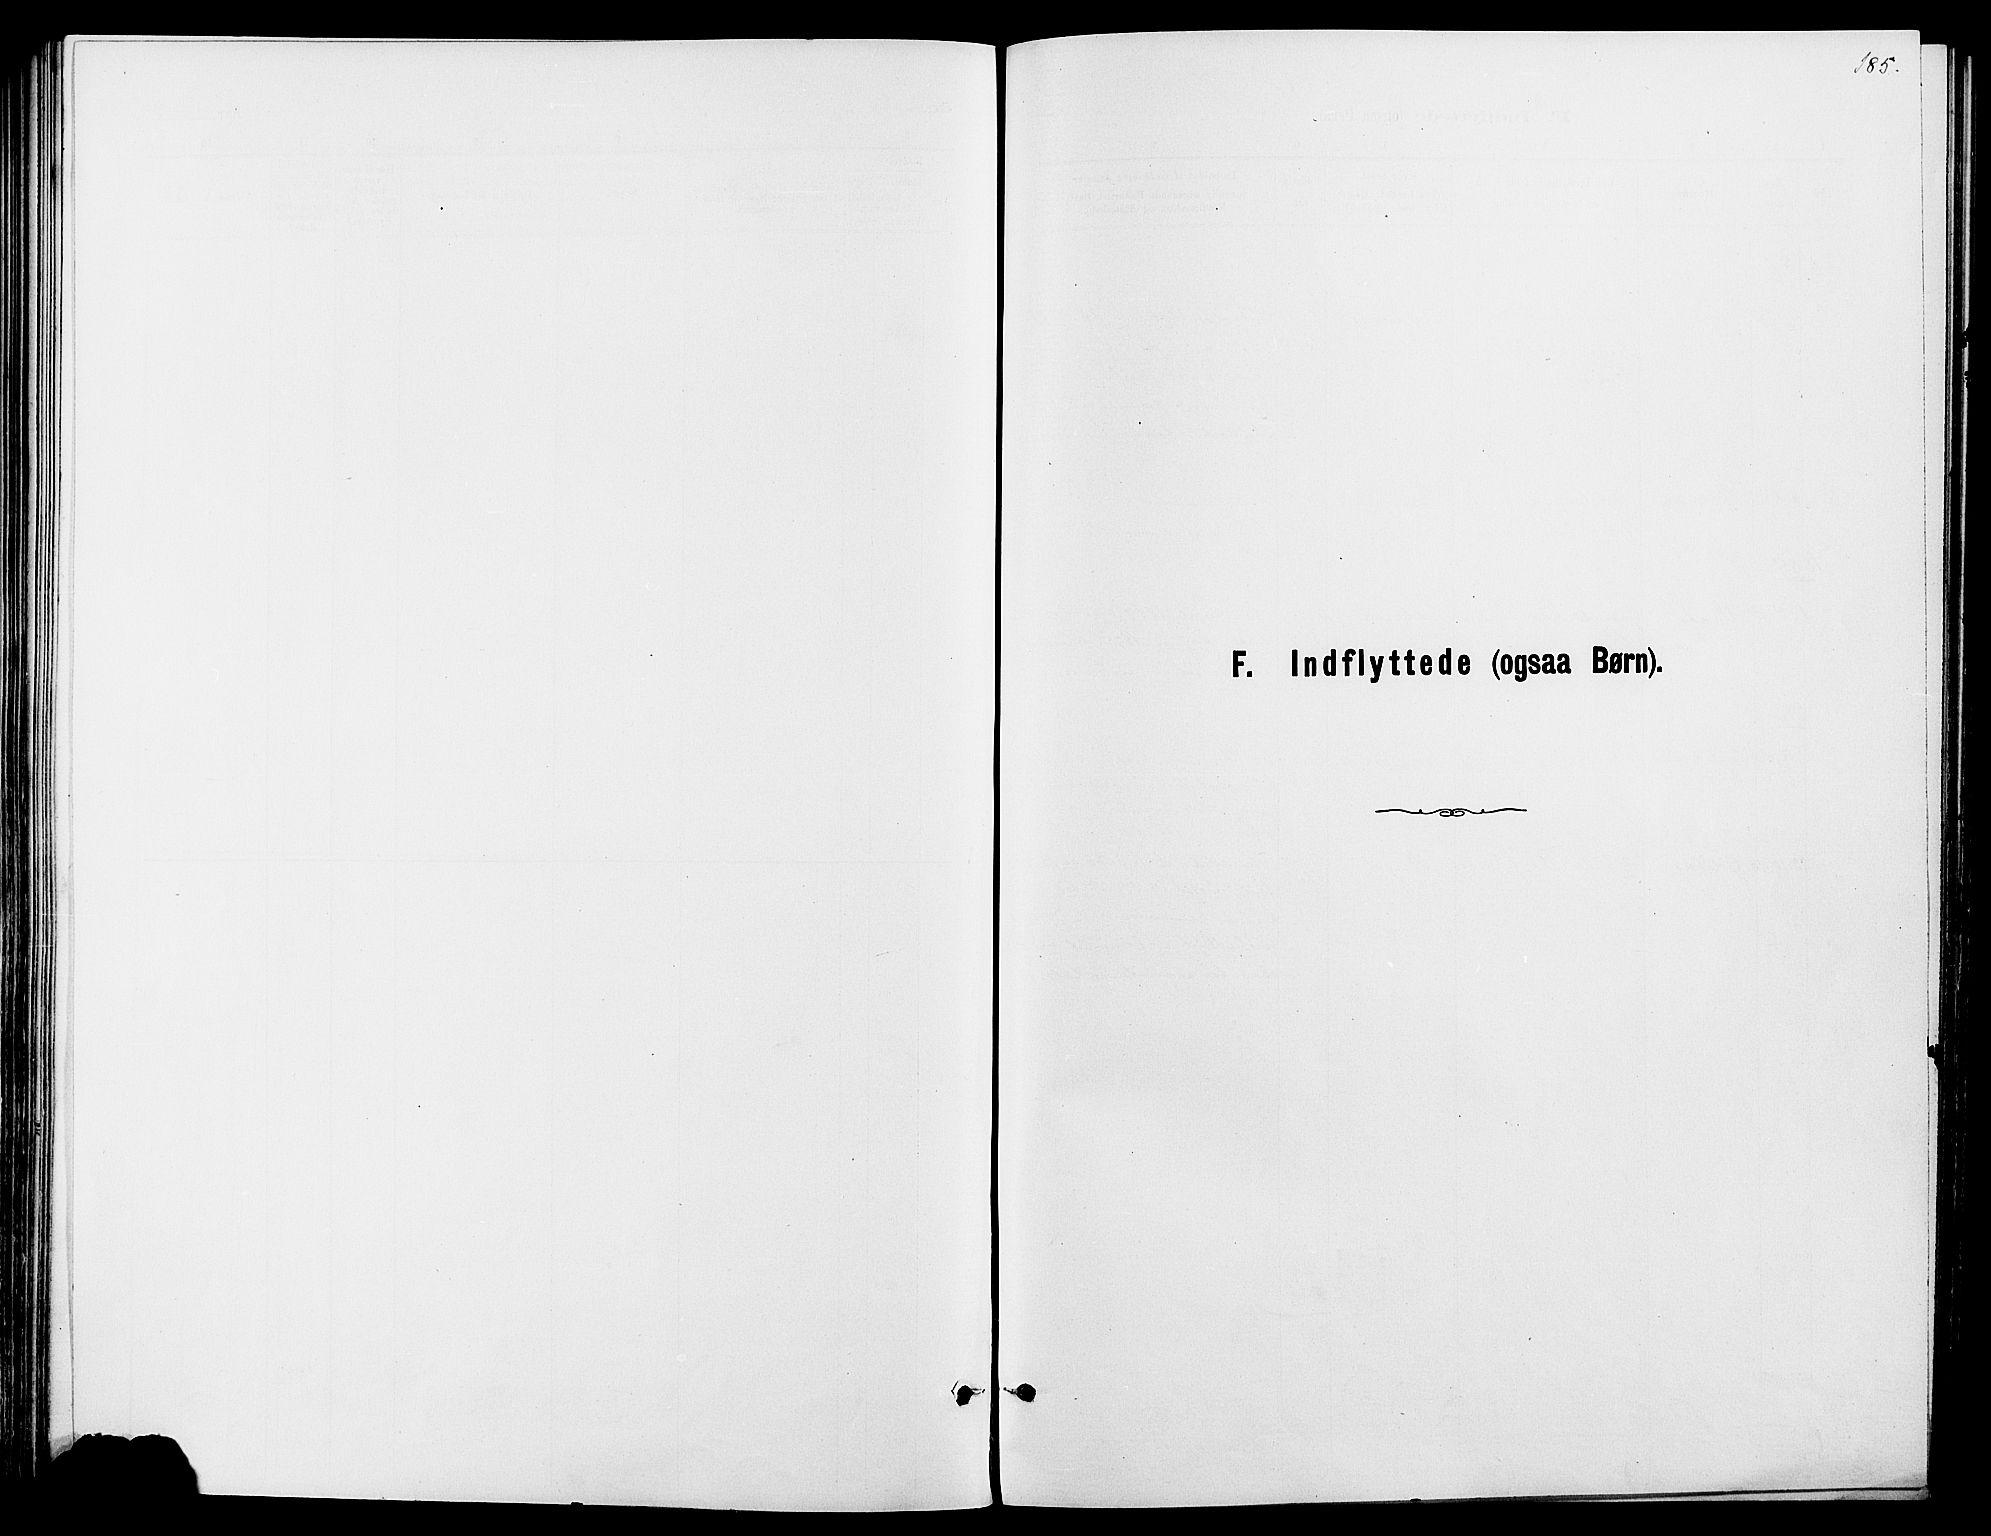 SAH, Dovre prestekontor, Ministerialbok nr. 2, 1879-1890, s. 185